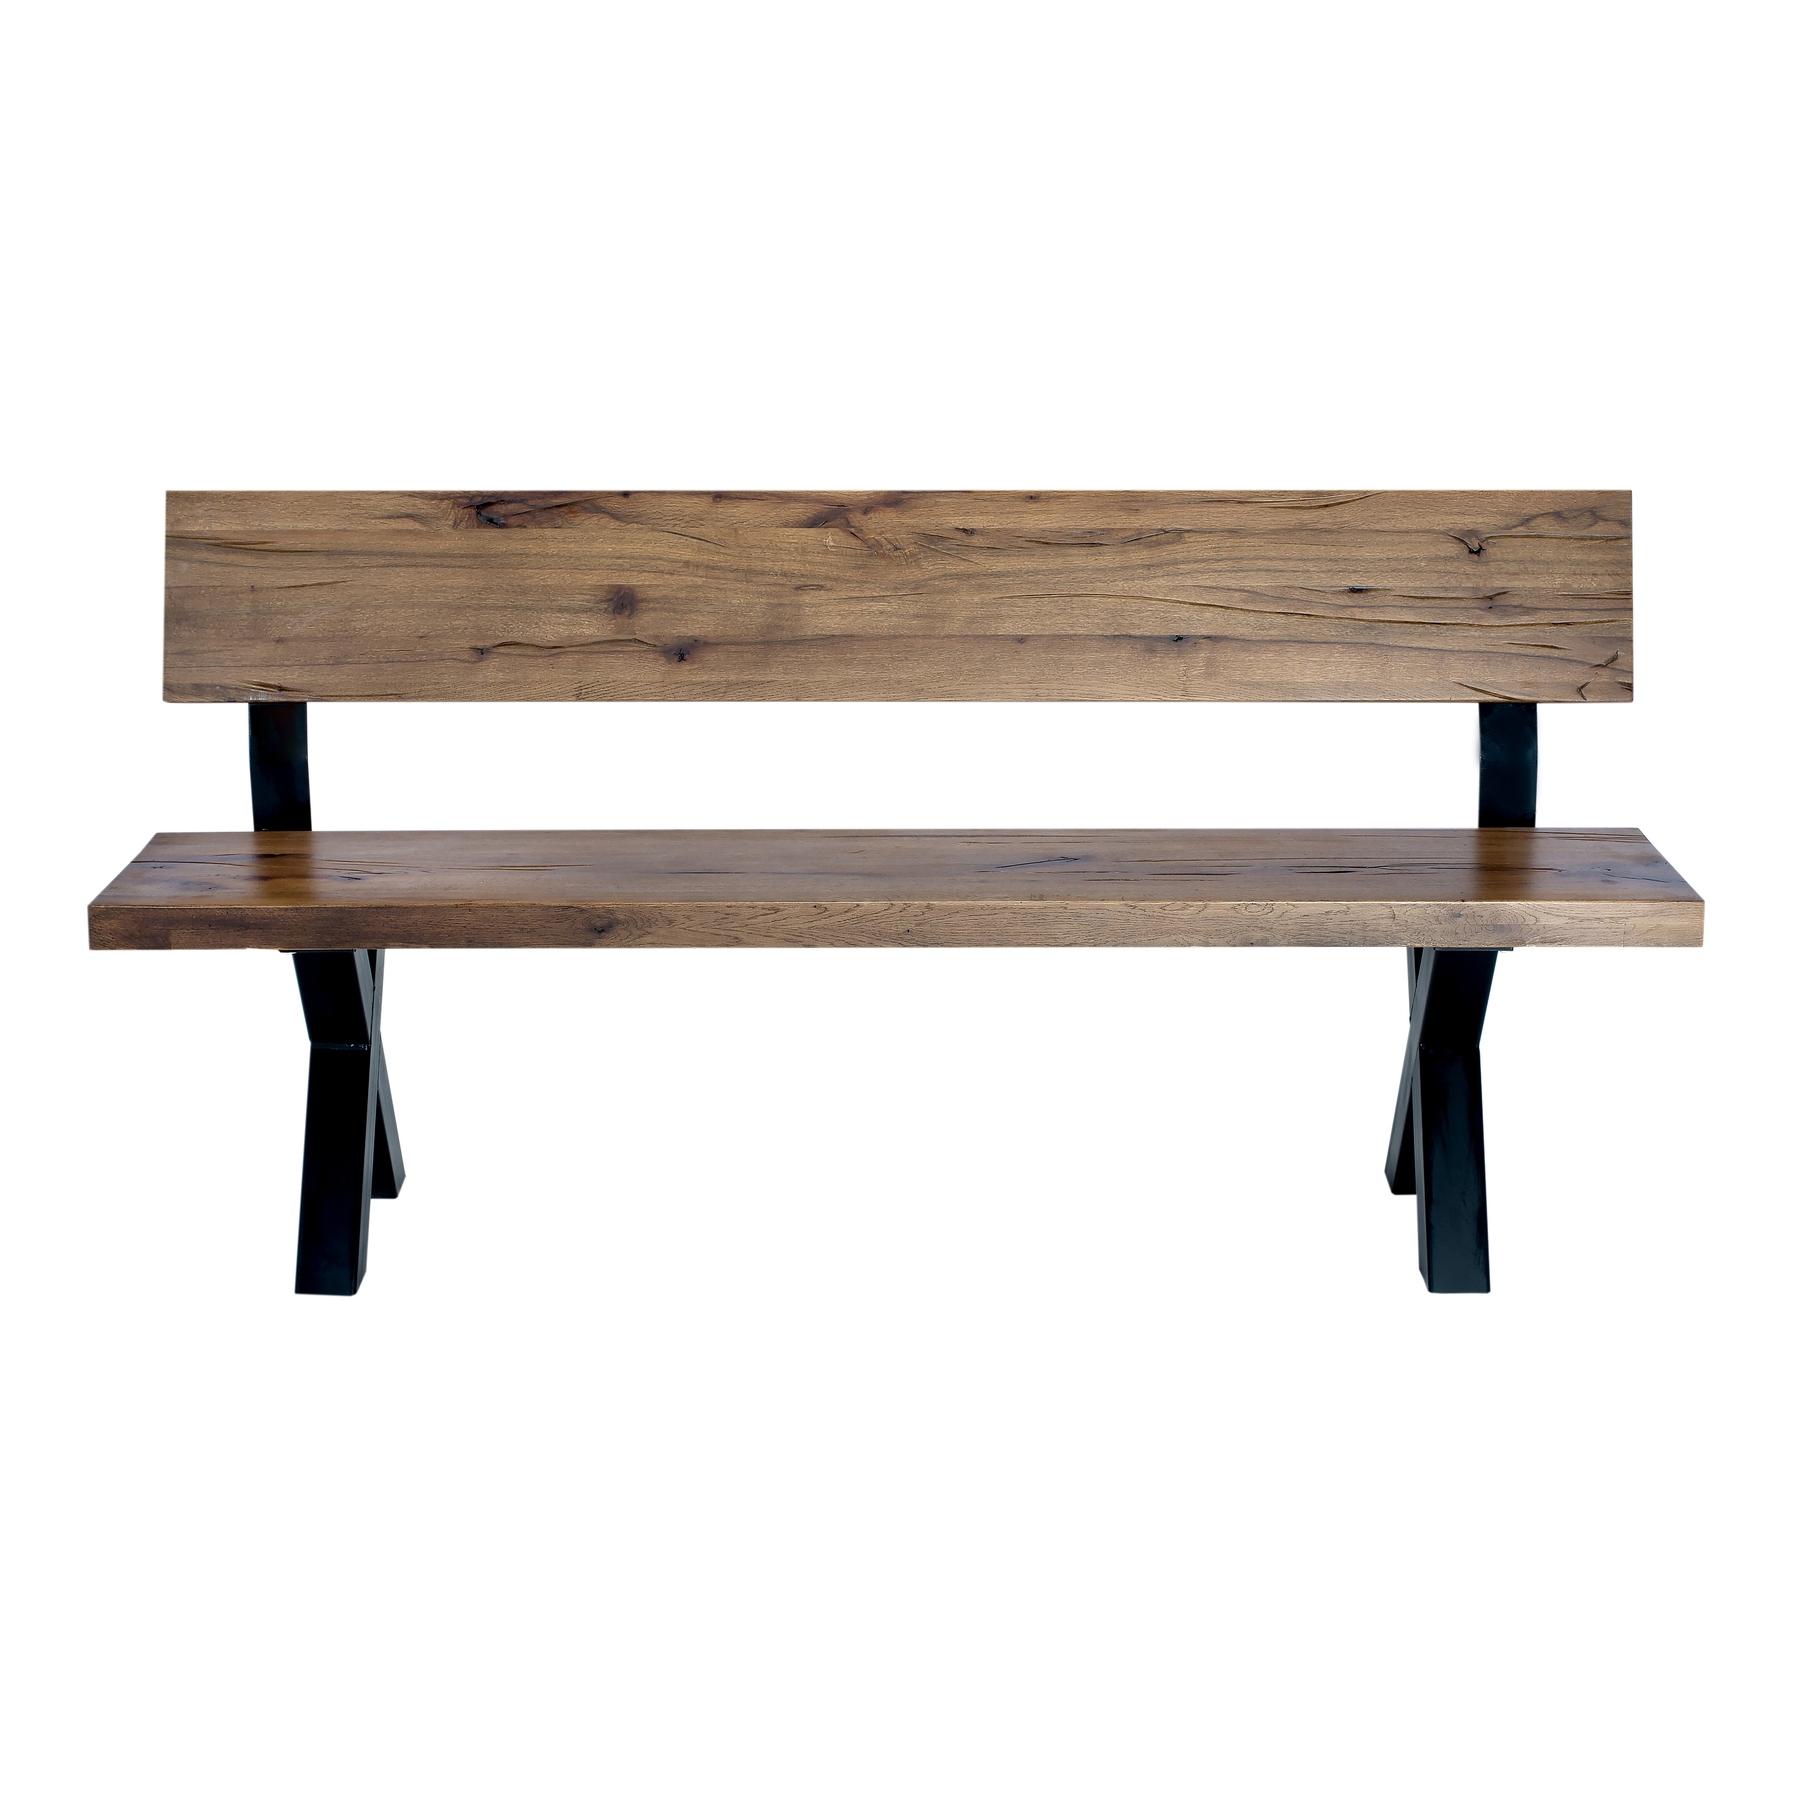 Banca din lemn de stejar salbatic cu picioare metalice Atena l240xA40xH75 cm